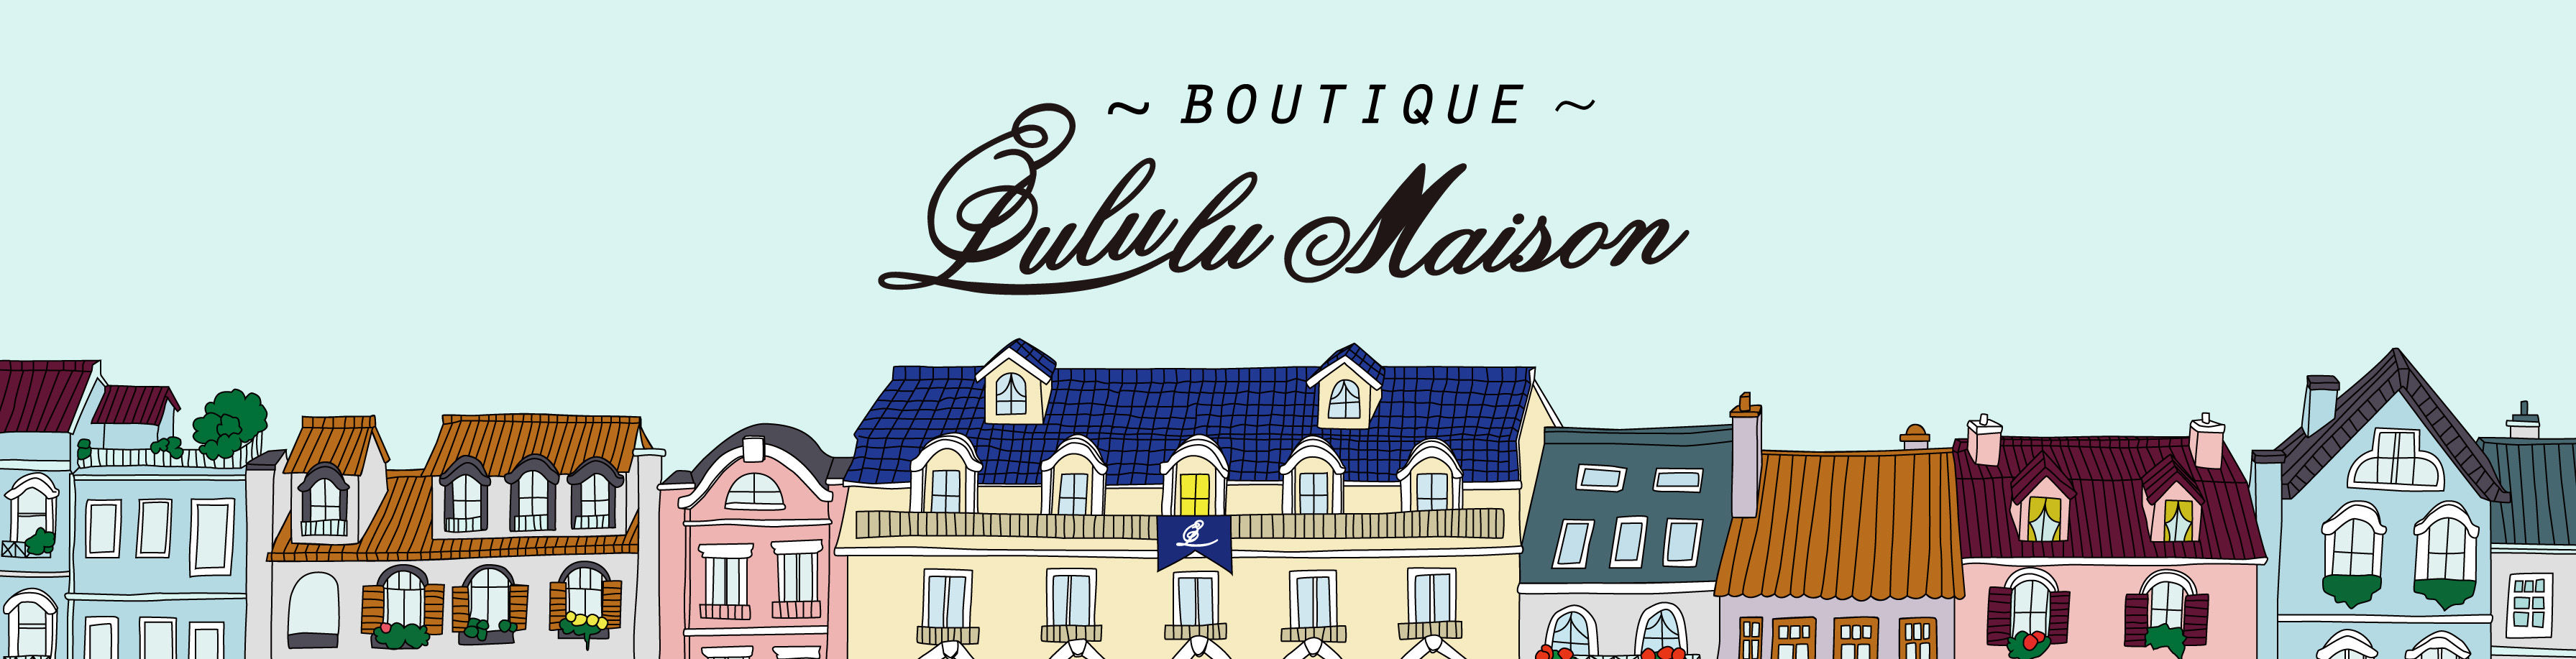 boutique LULULU